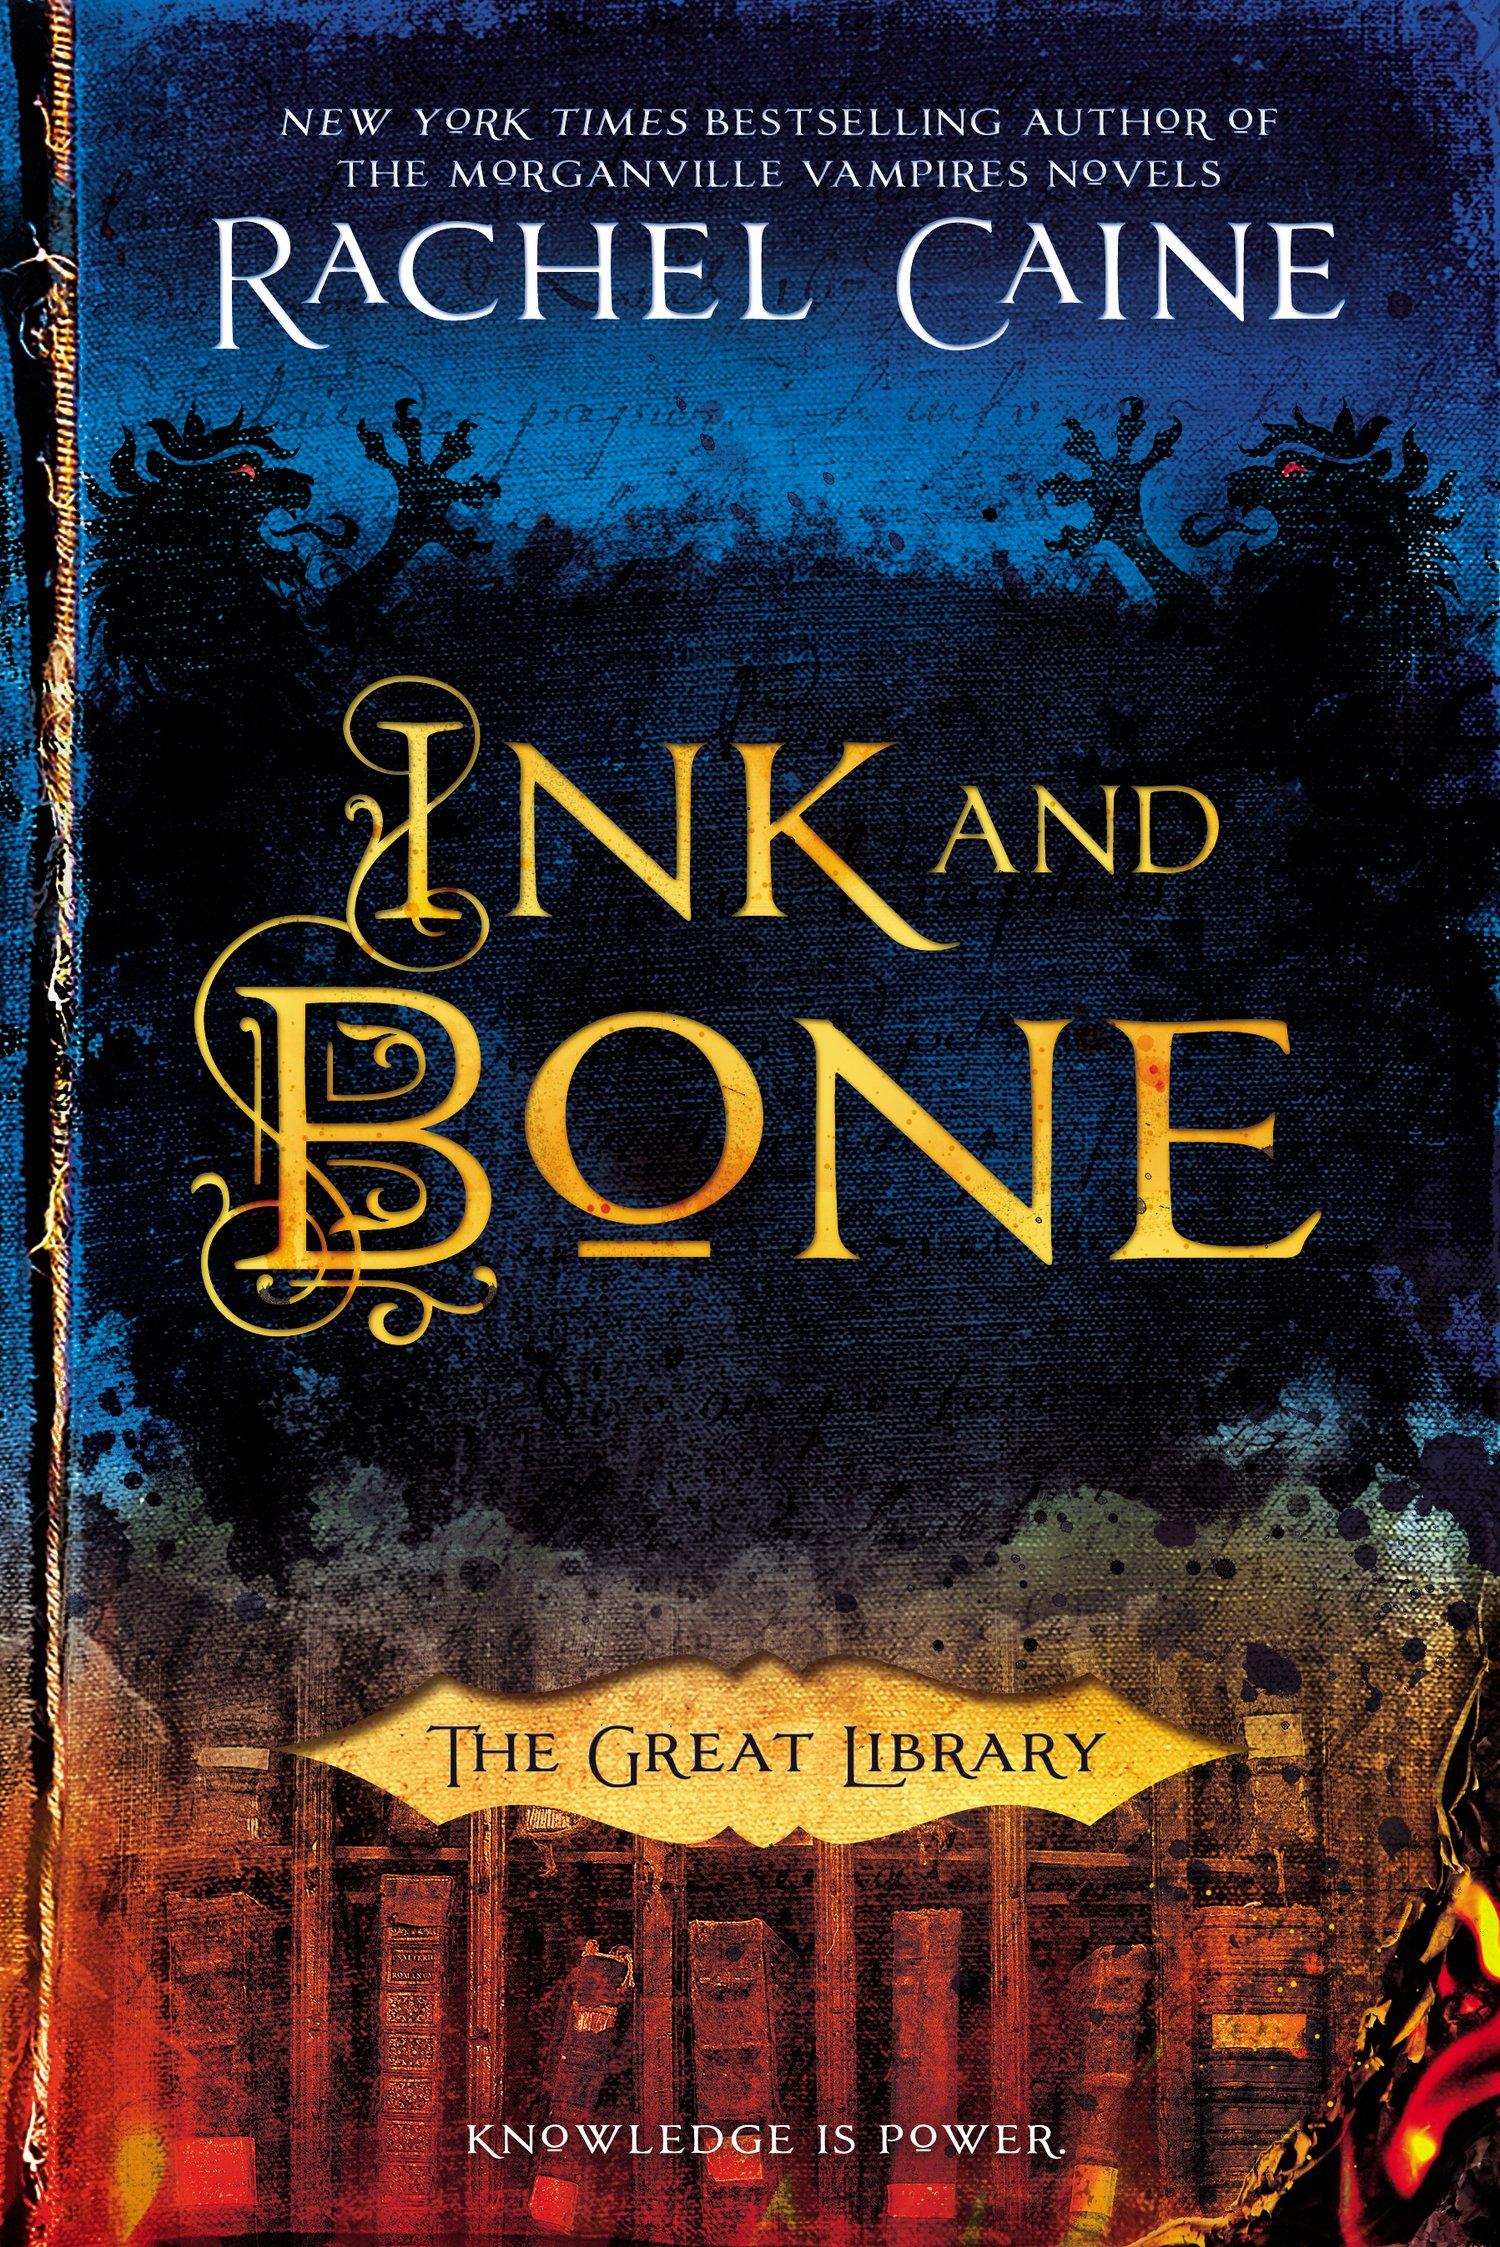 Bone the nerd